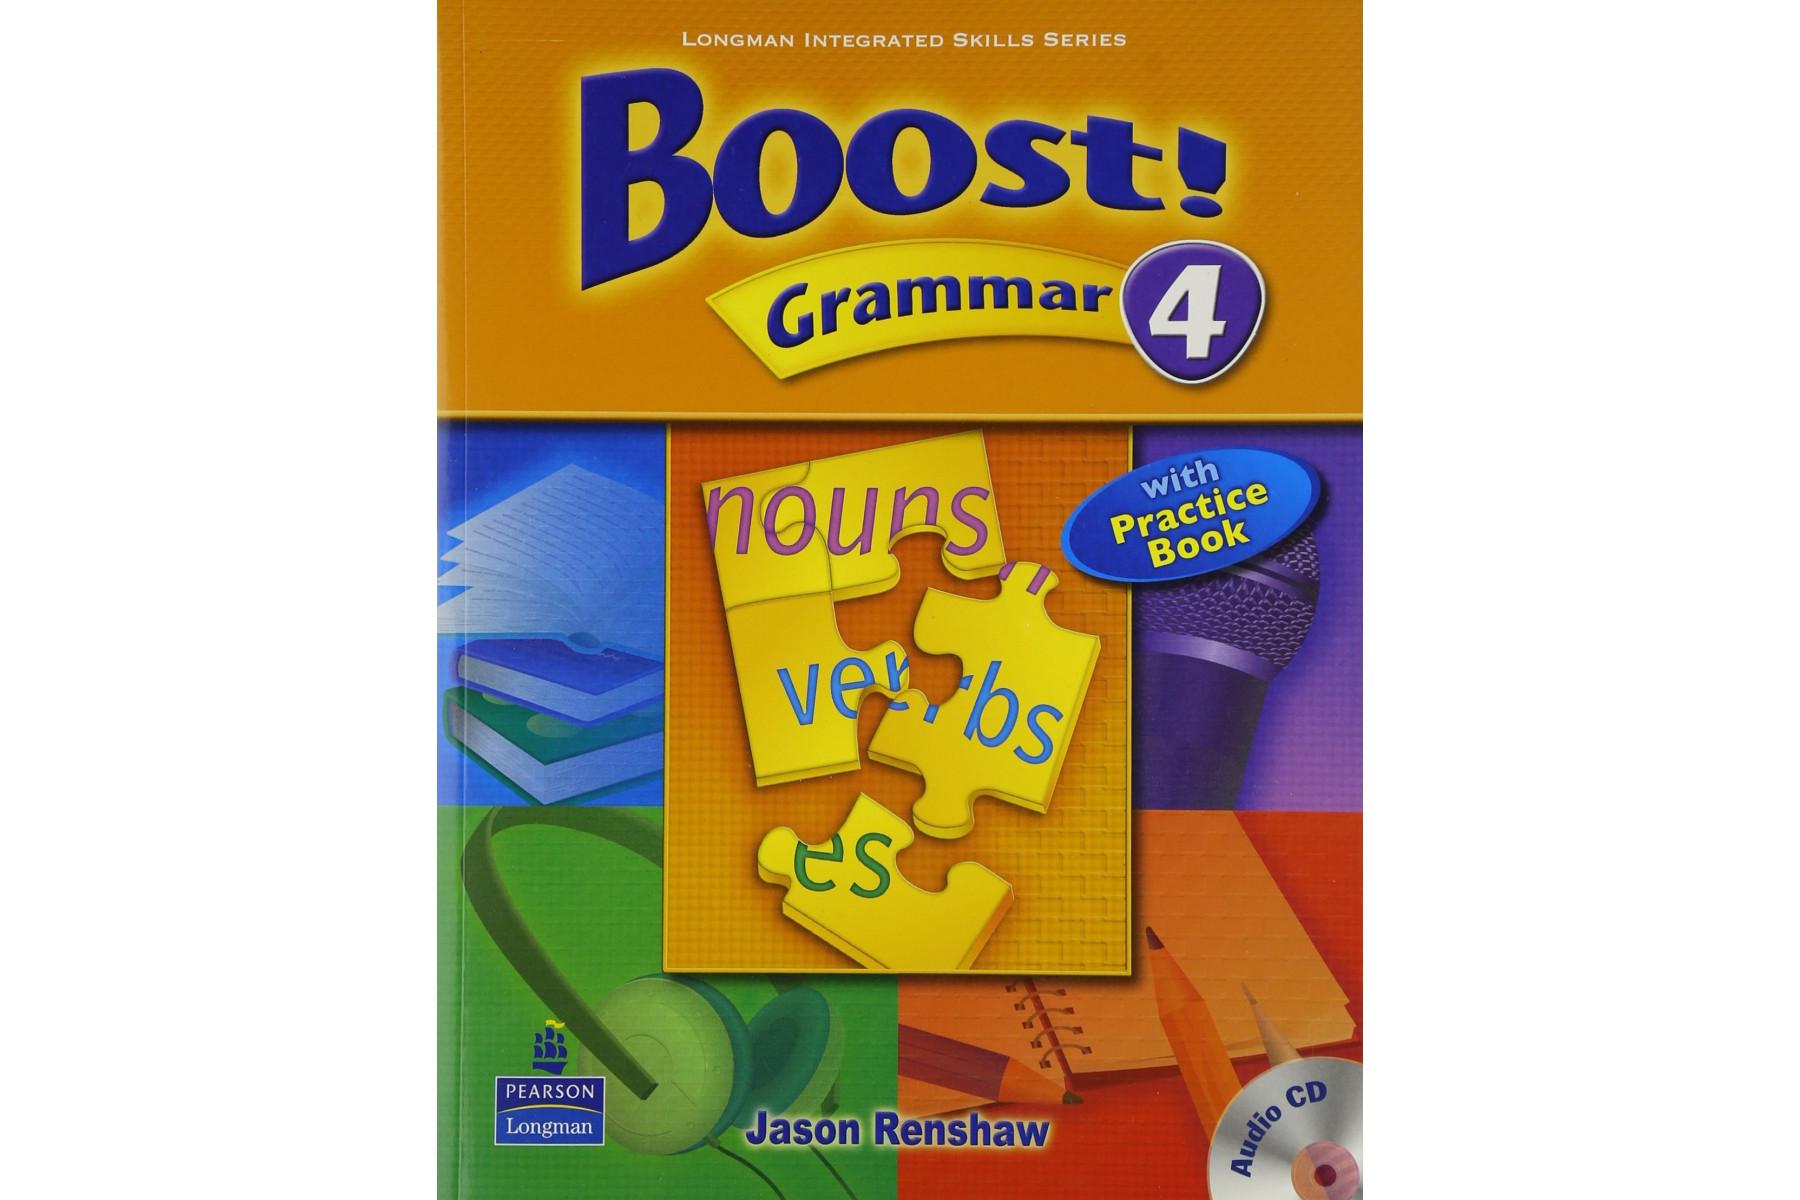 Boost! Grammar: Student Book Level 4